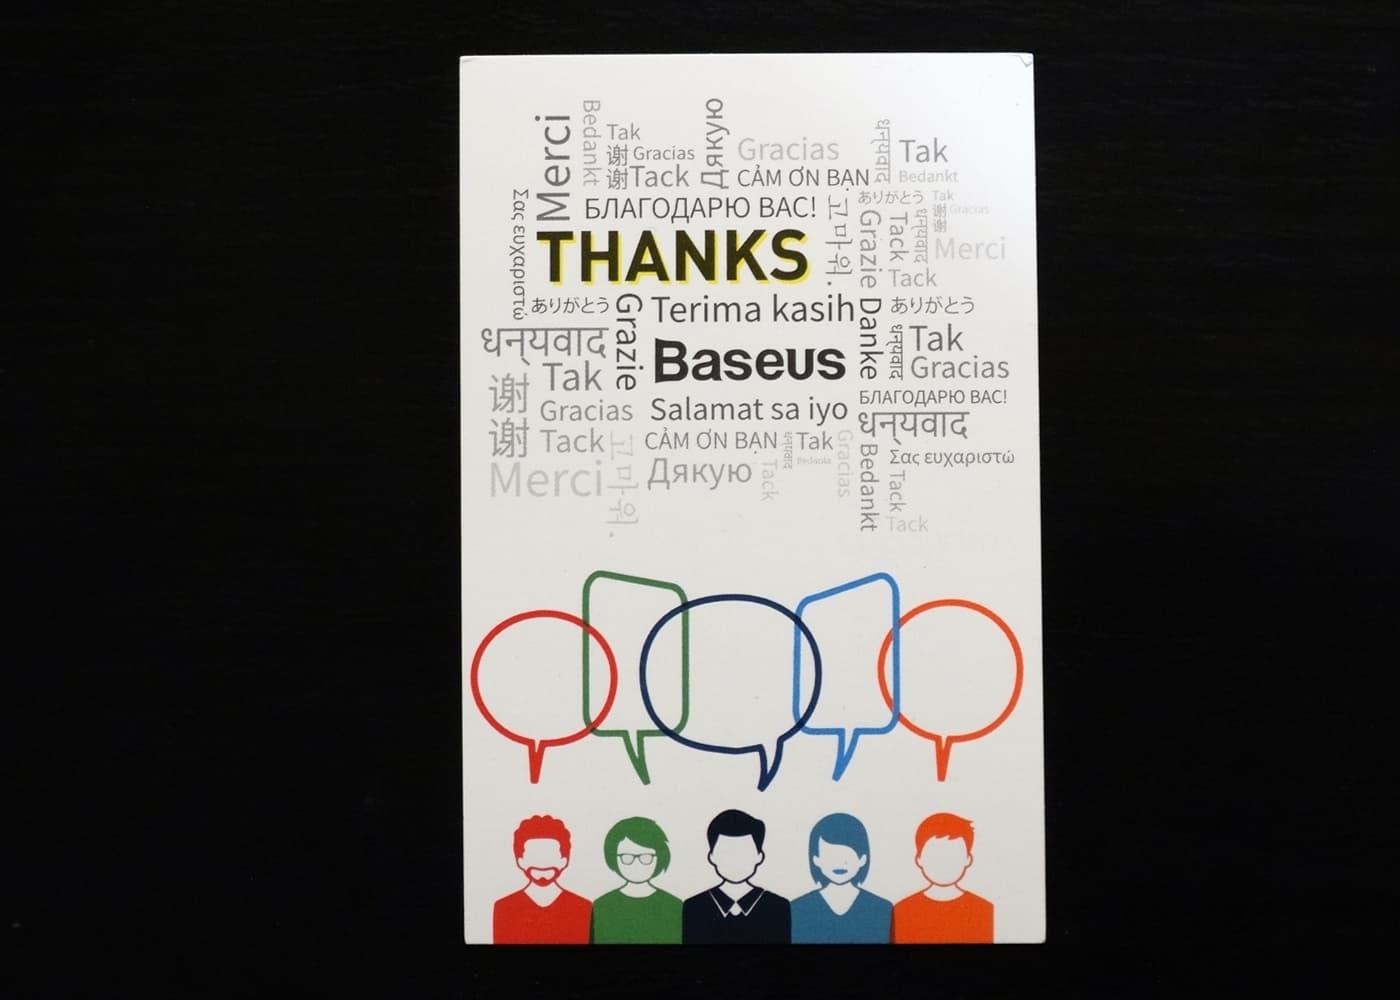 благодарности от Baseus